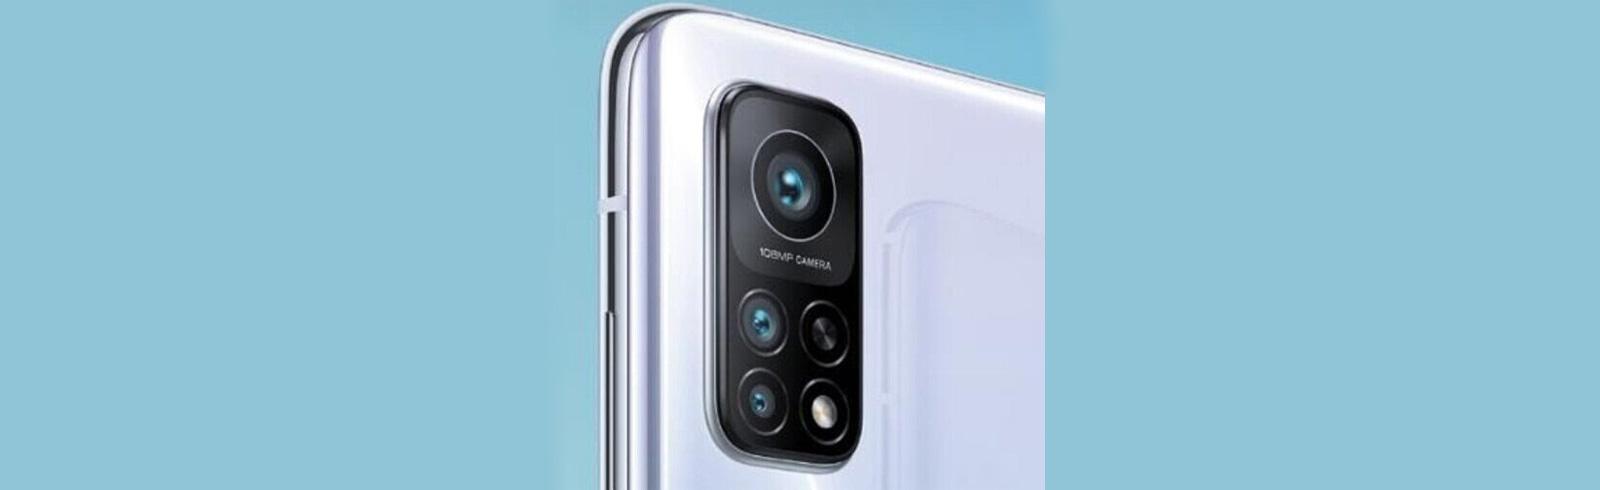 Xiaomi Mi 10T/Mi 10T Pro leaks in real photos, basic specs in tow